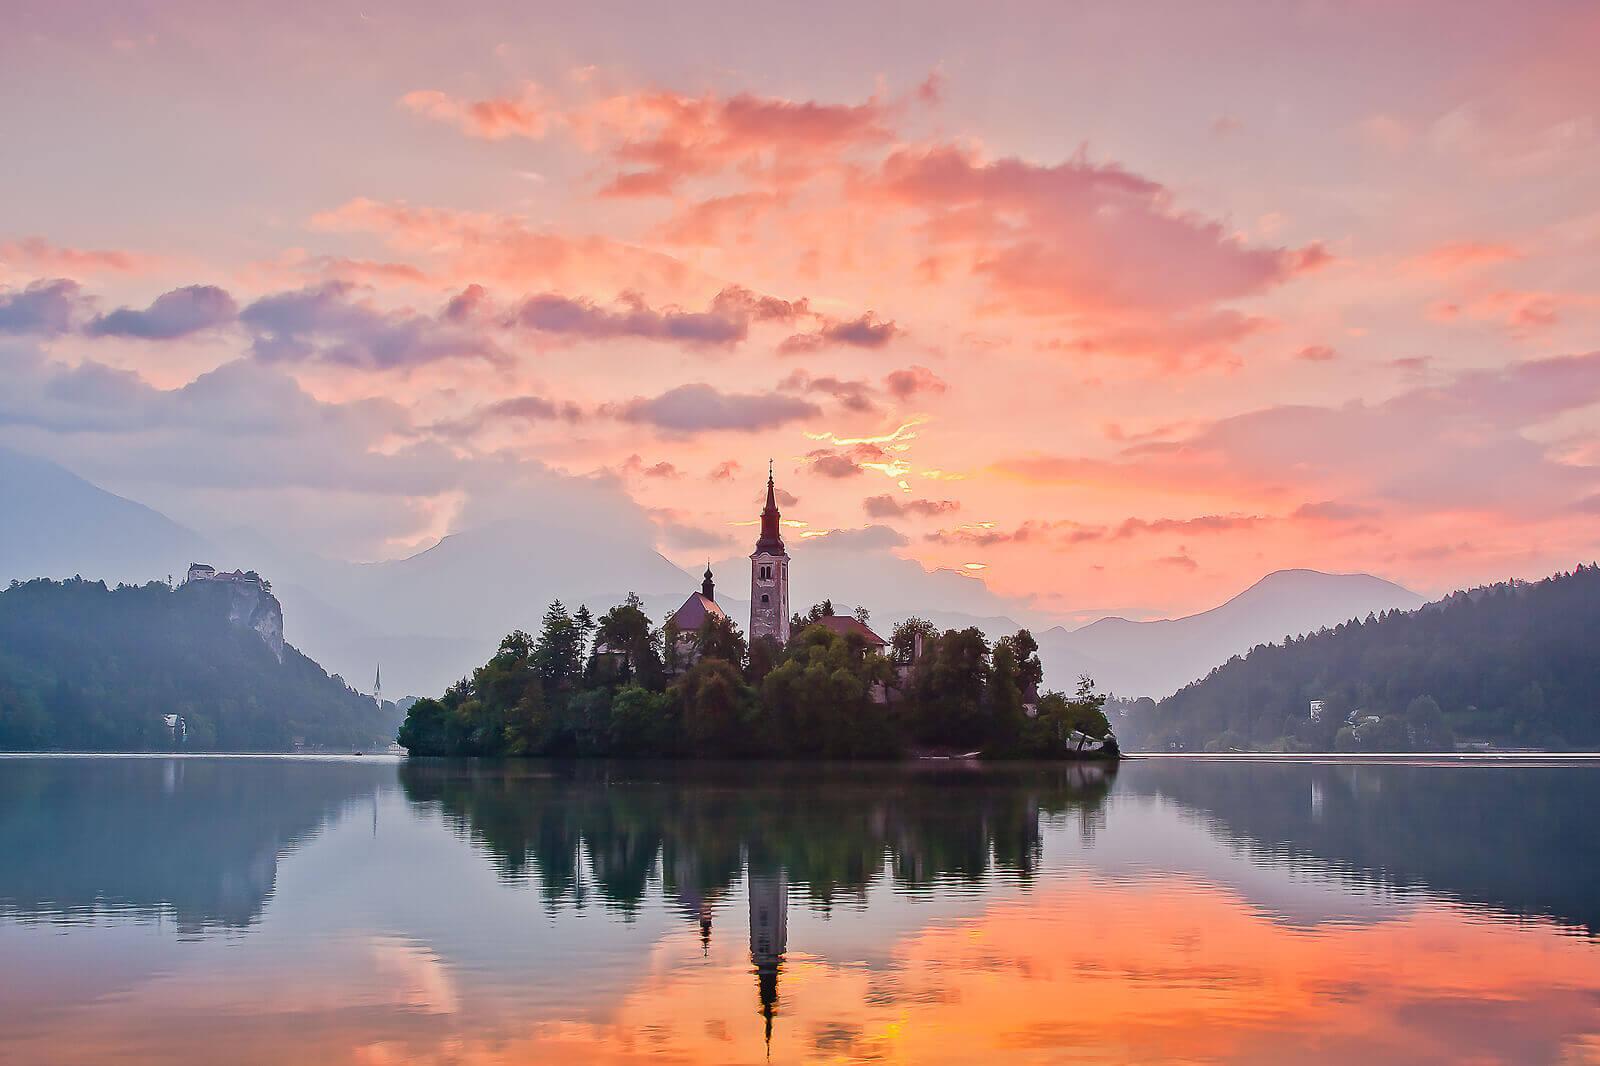 bled-lake-sun-set-leisure-group-destination-slovenia